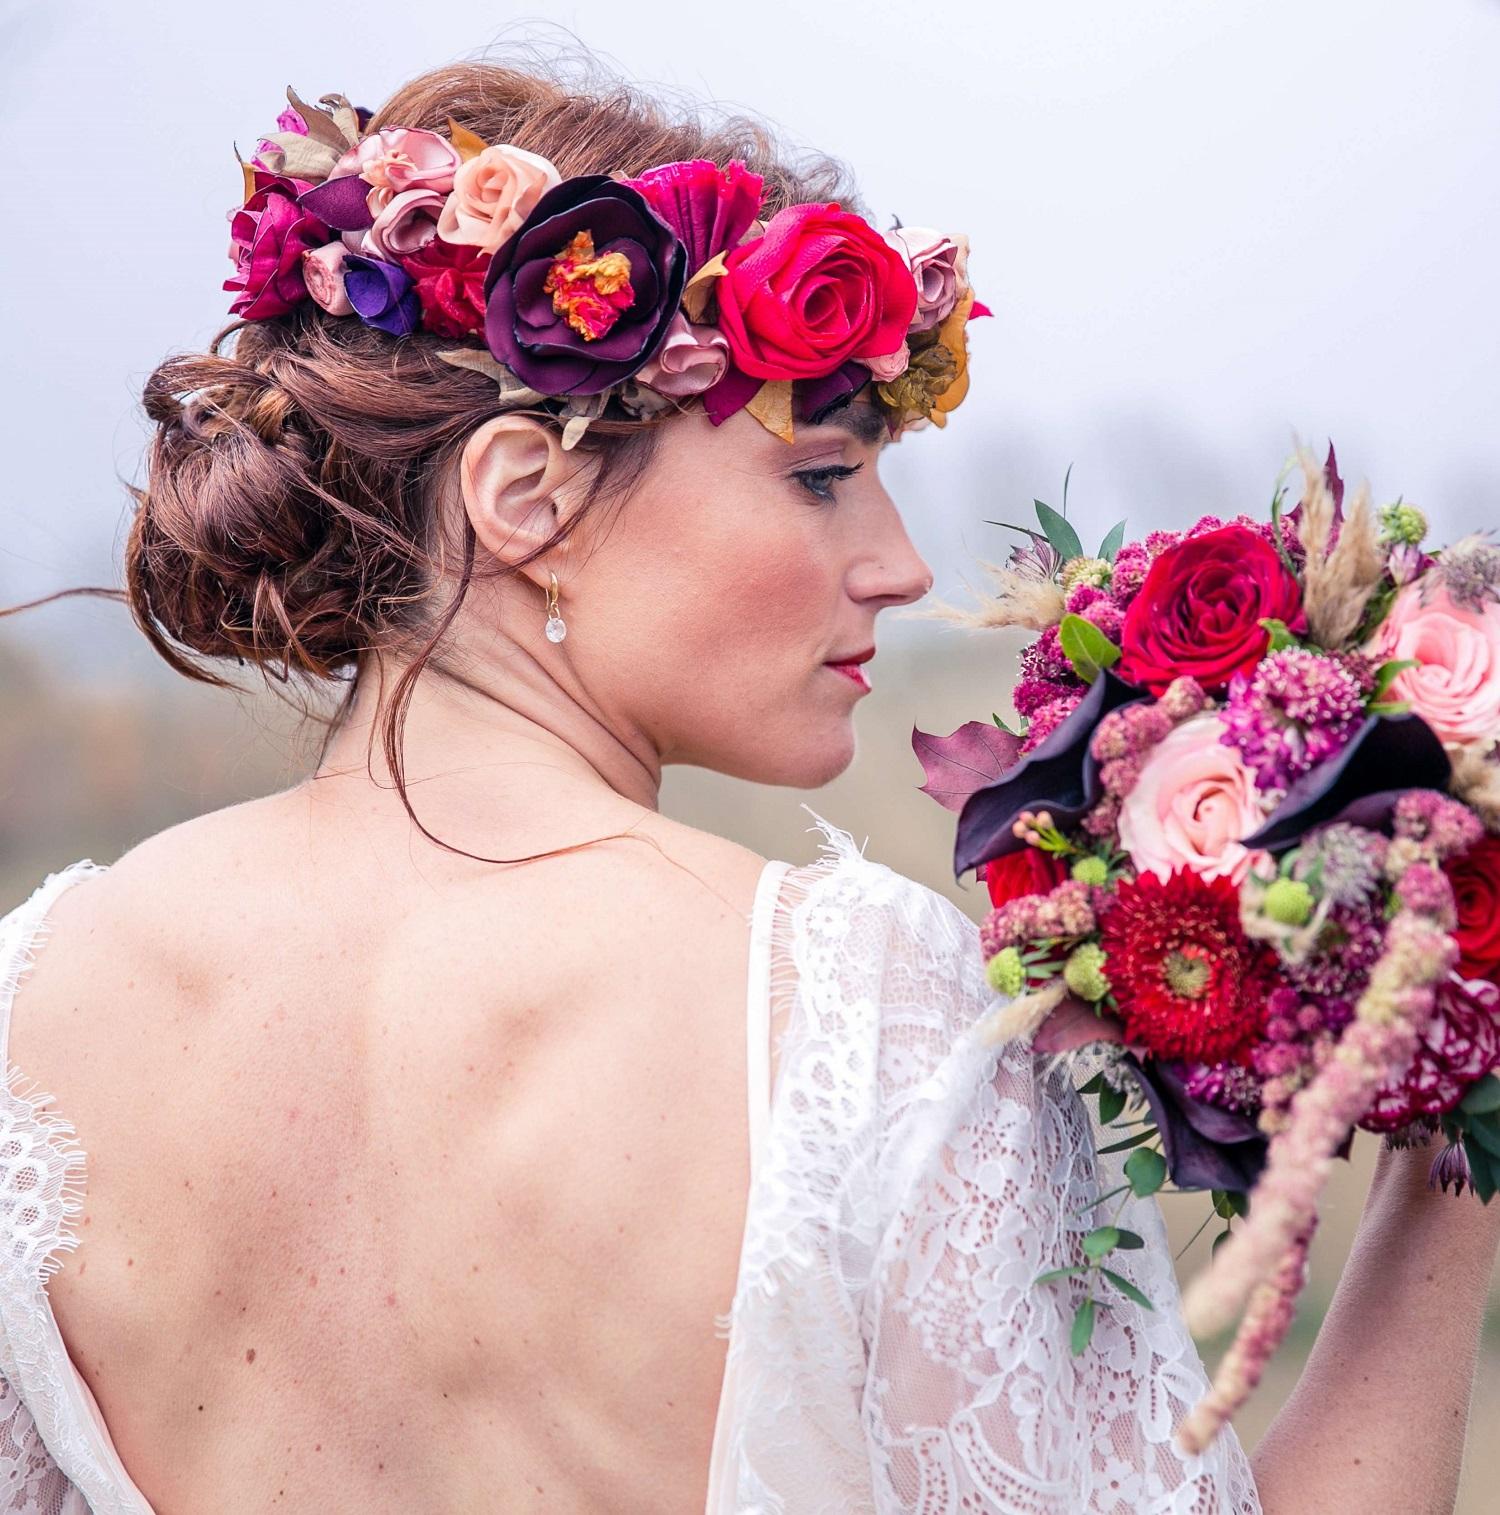 Couronne florale mariée modèle Elia Alice MARTY Couture florale Accessoires mariée marié cortège